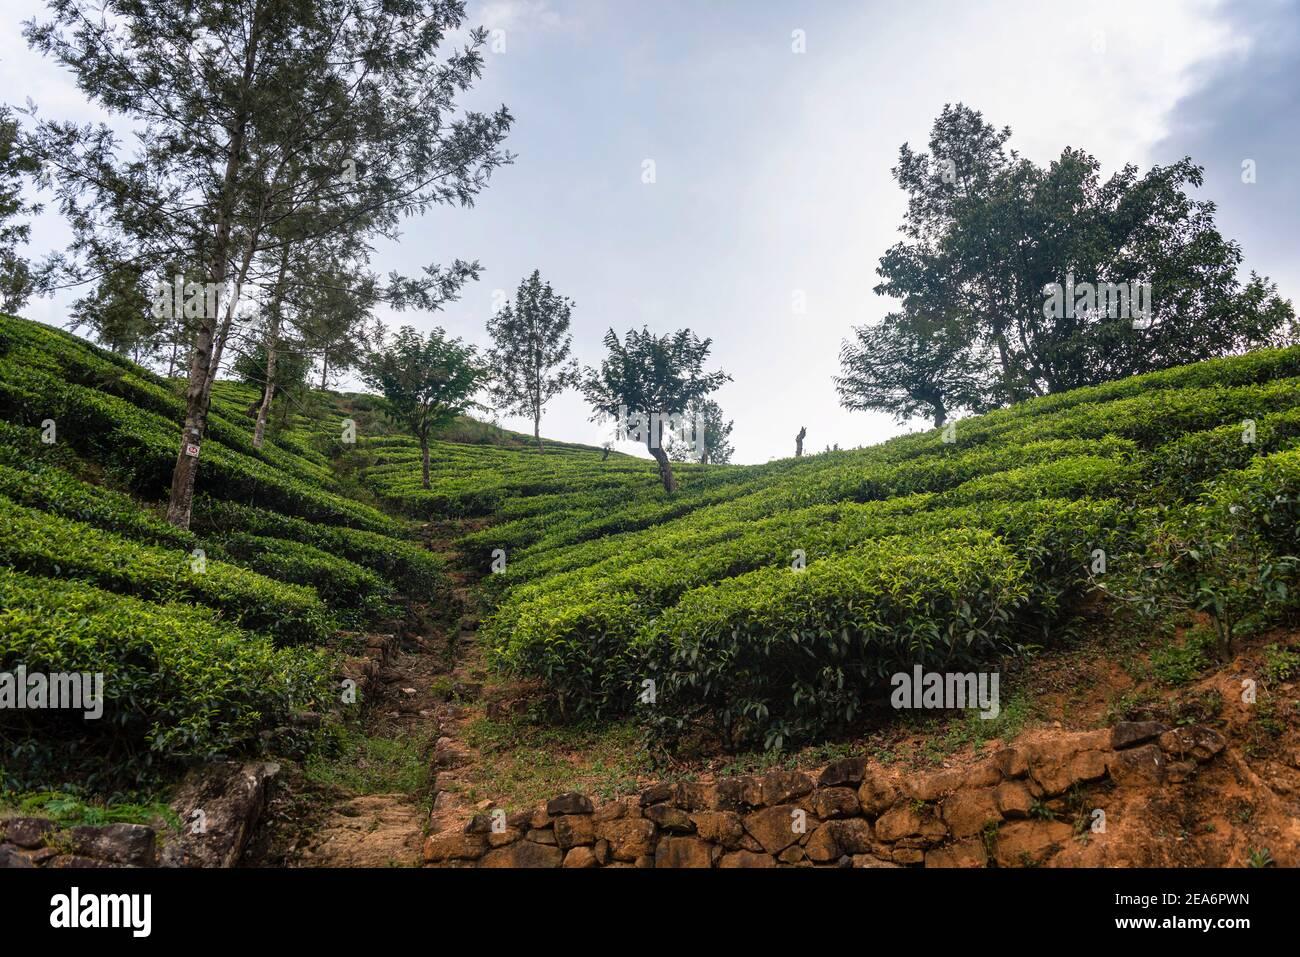 Beautiful lush green tea plantation field in the mountain area, hill county of Sri Lanka. Near Adams Peak Stock Photo